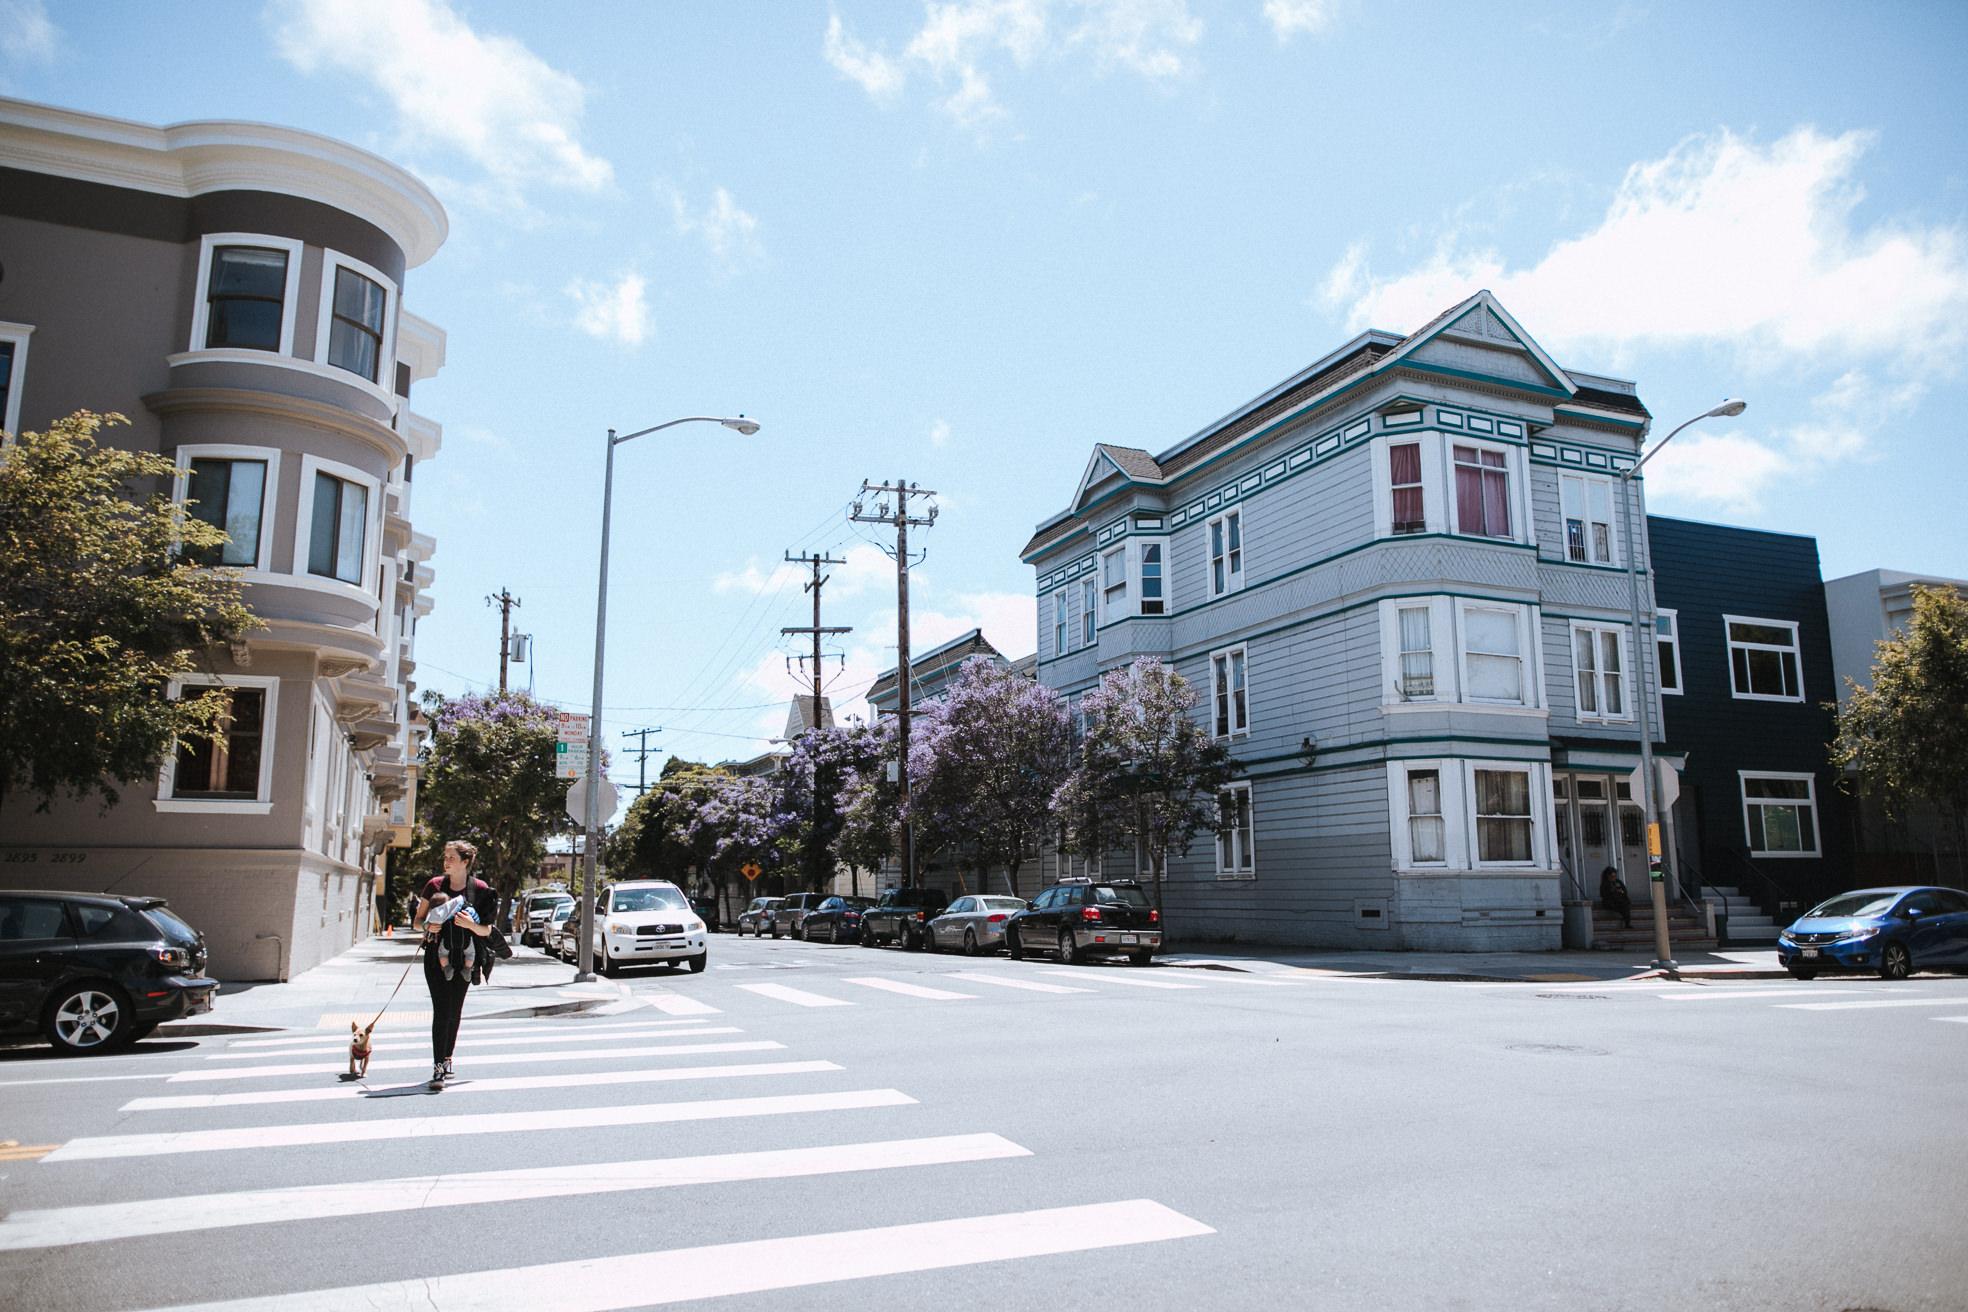 San-Francisco-BildervomLeben-4959